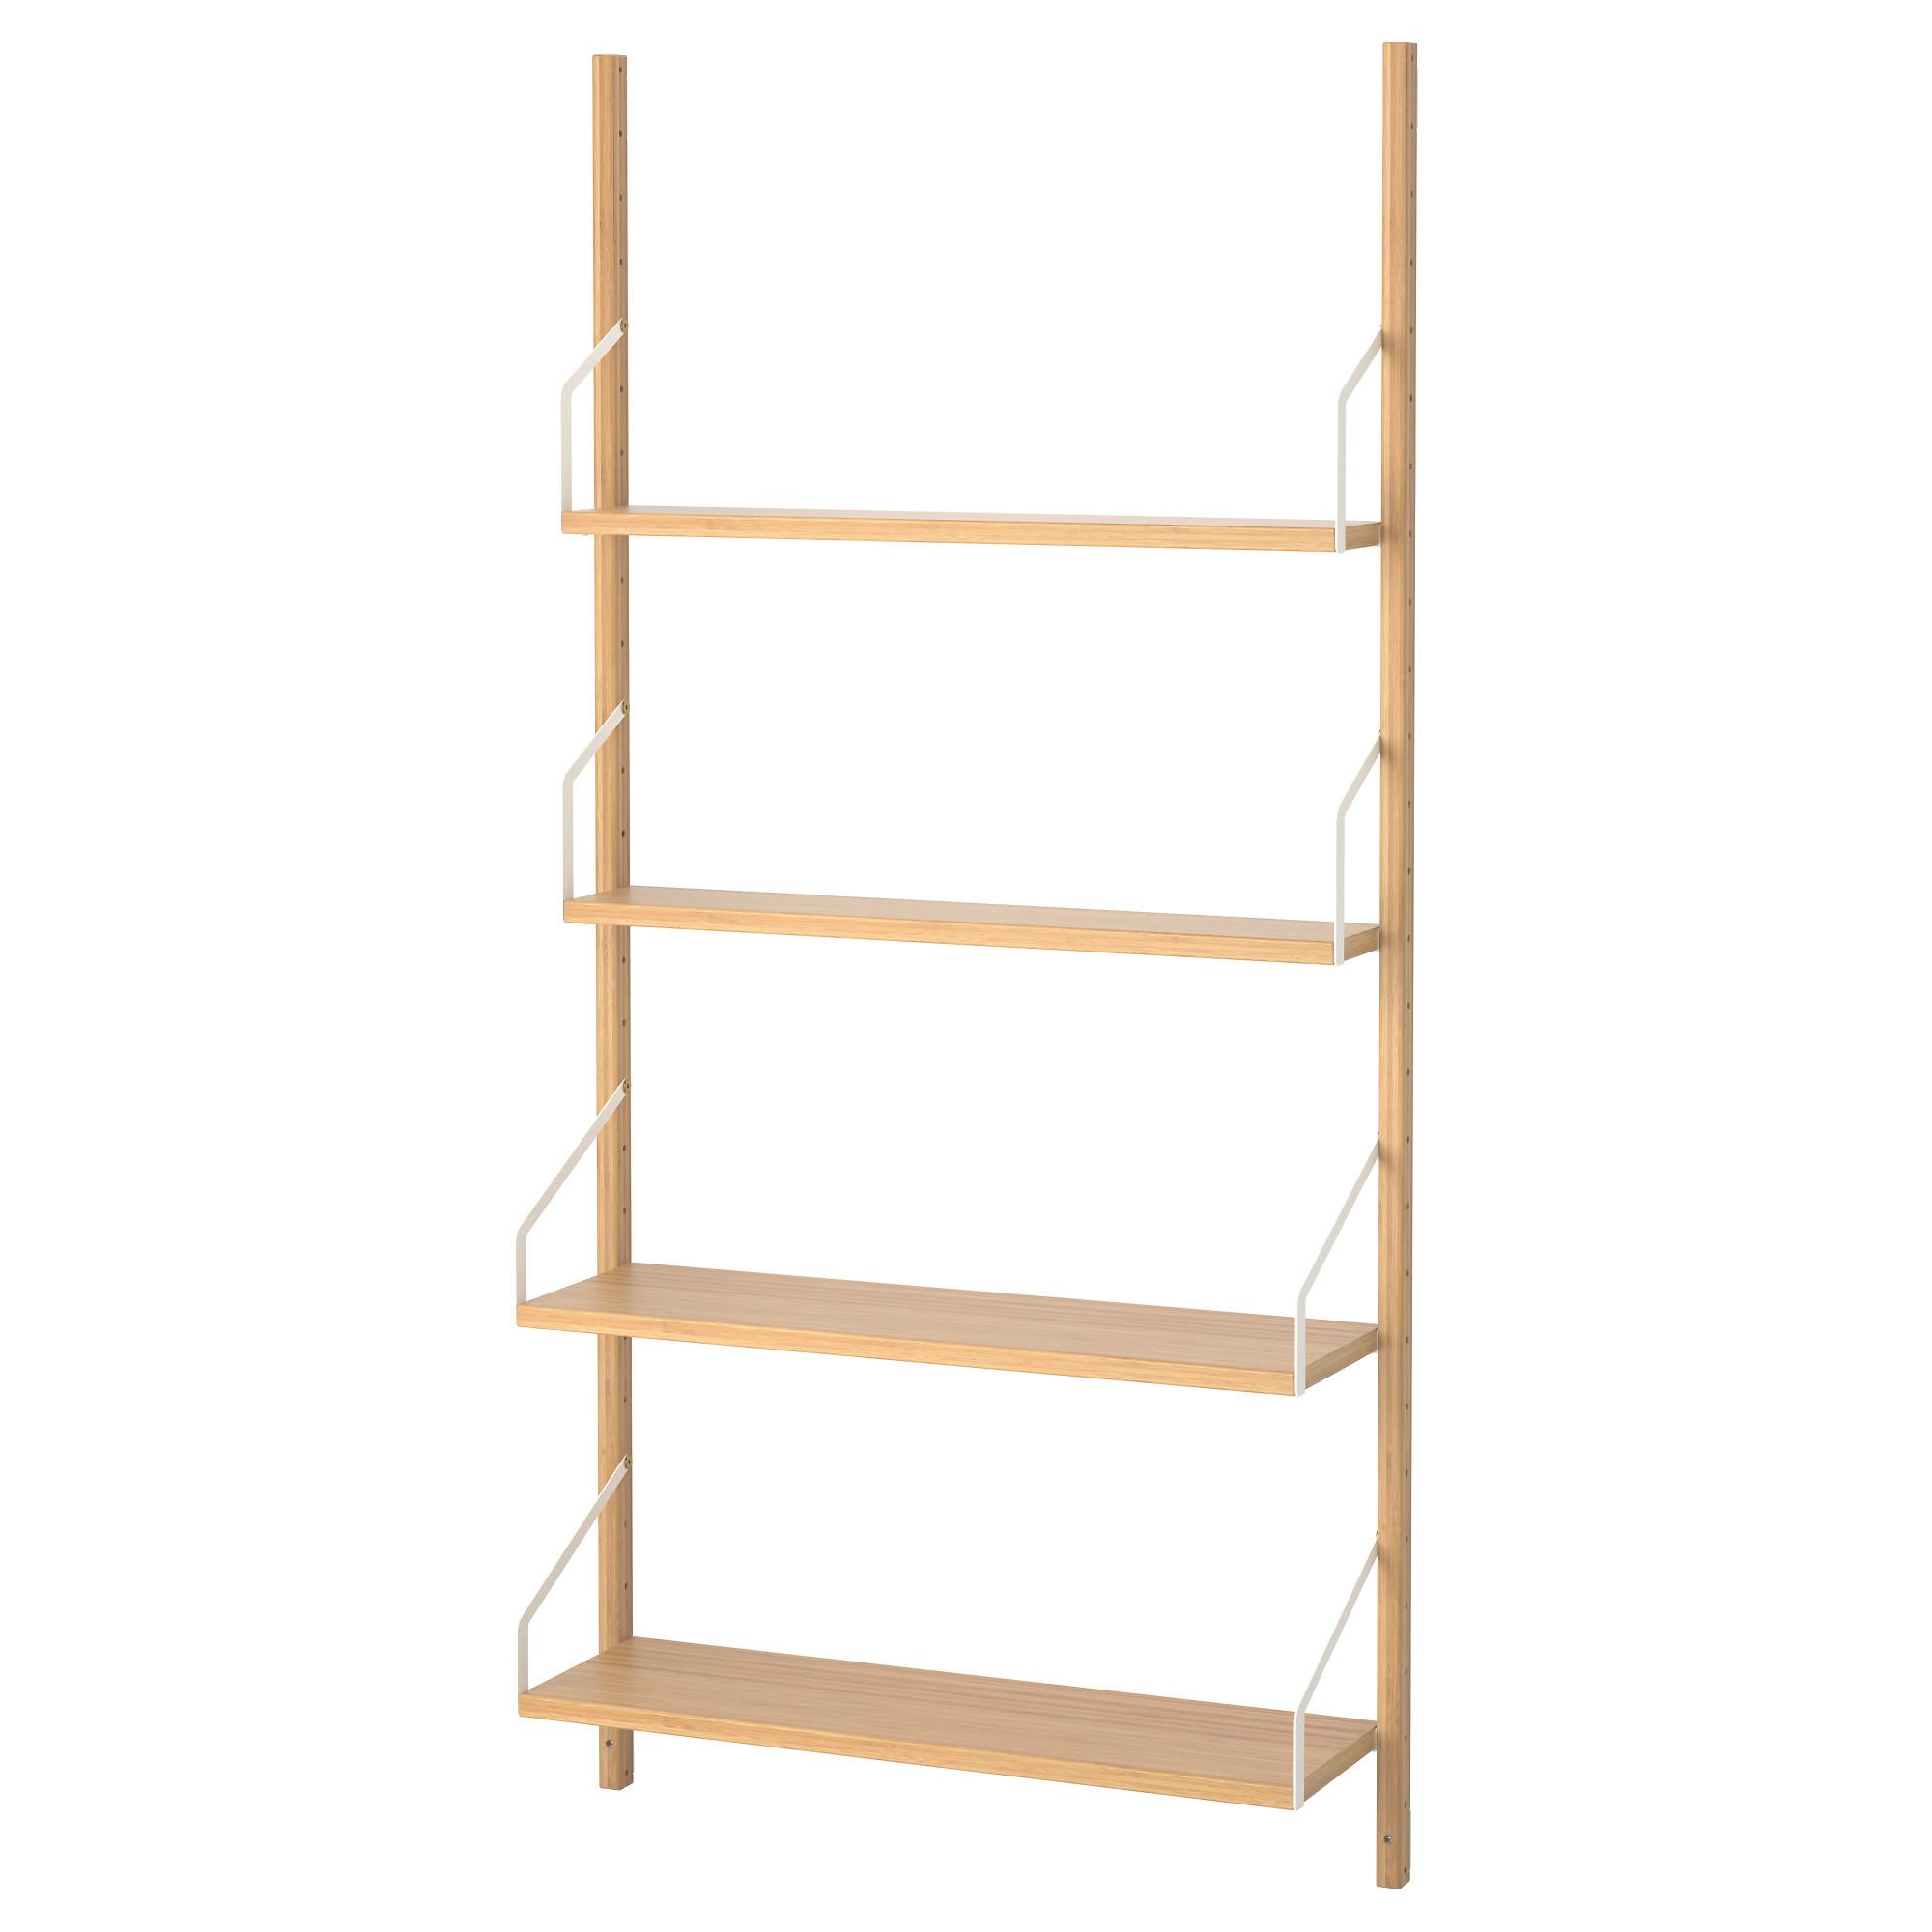 inch wide shelving unit shelves target wall mounted shelf combination bamboo ikea kallax bookcase ideas svalns wallmounted expedit instructions bookshelves floating cubes cube